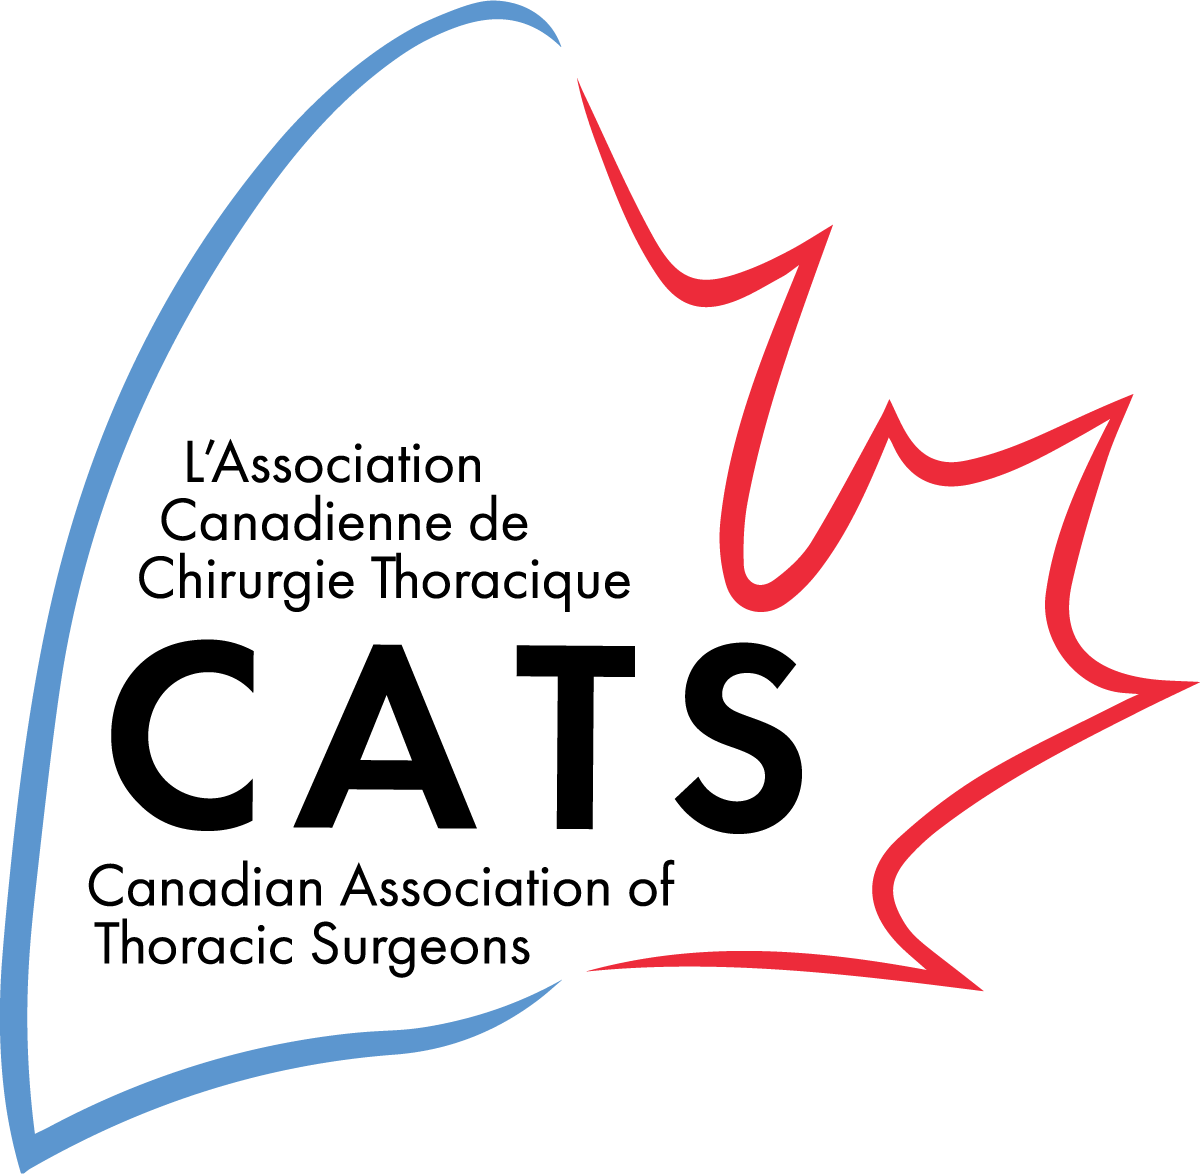 Canadian Association of Thoracic Surgeons